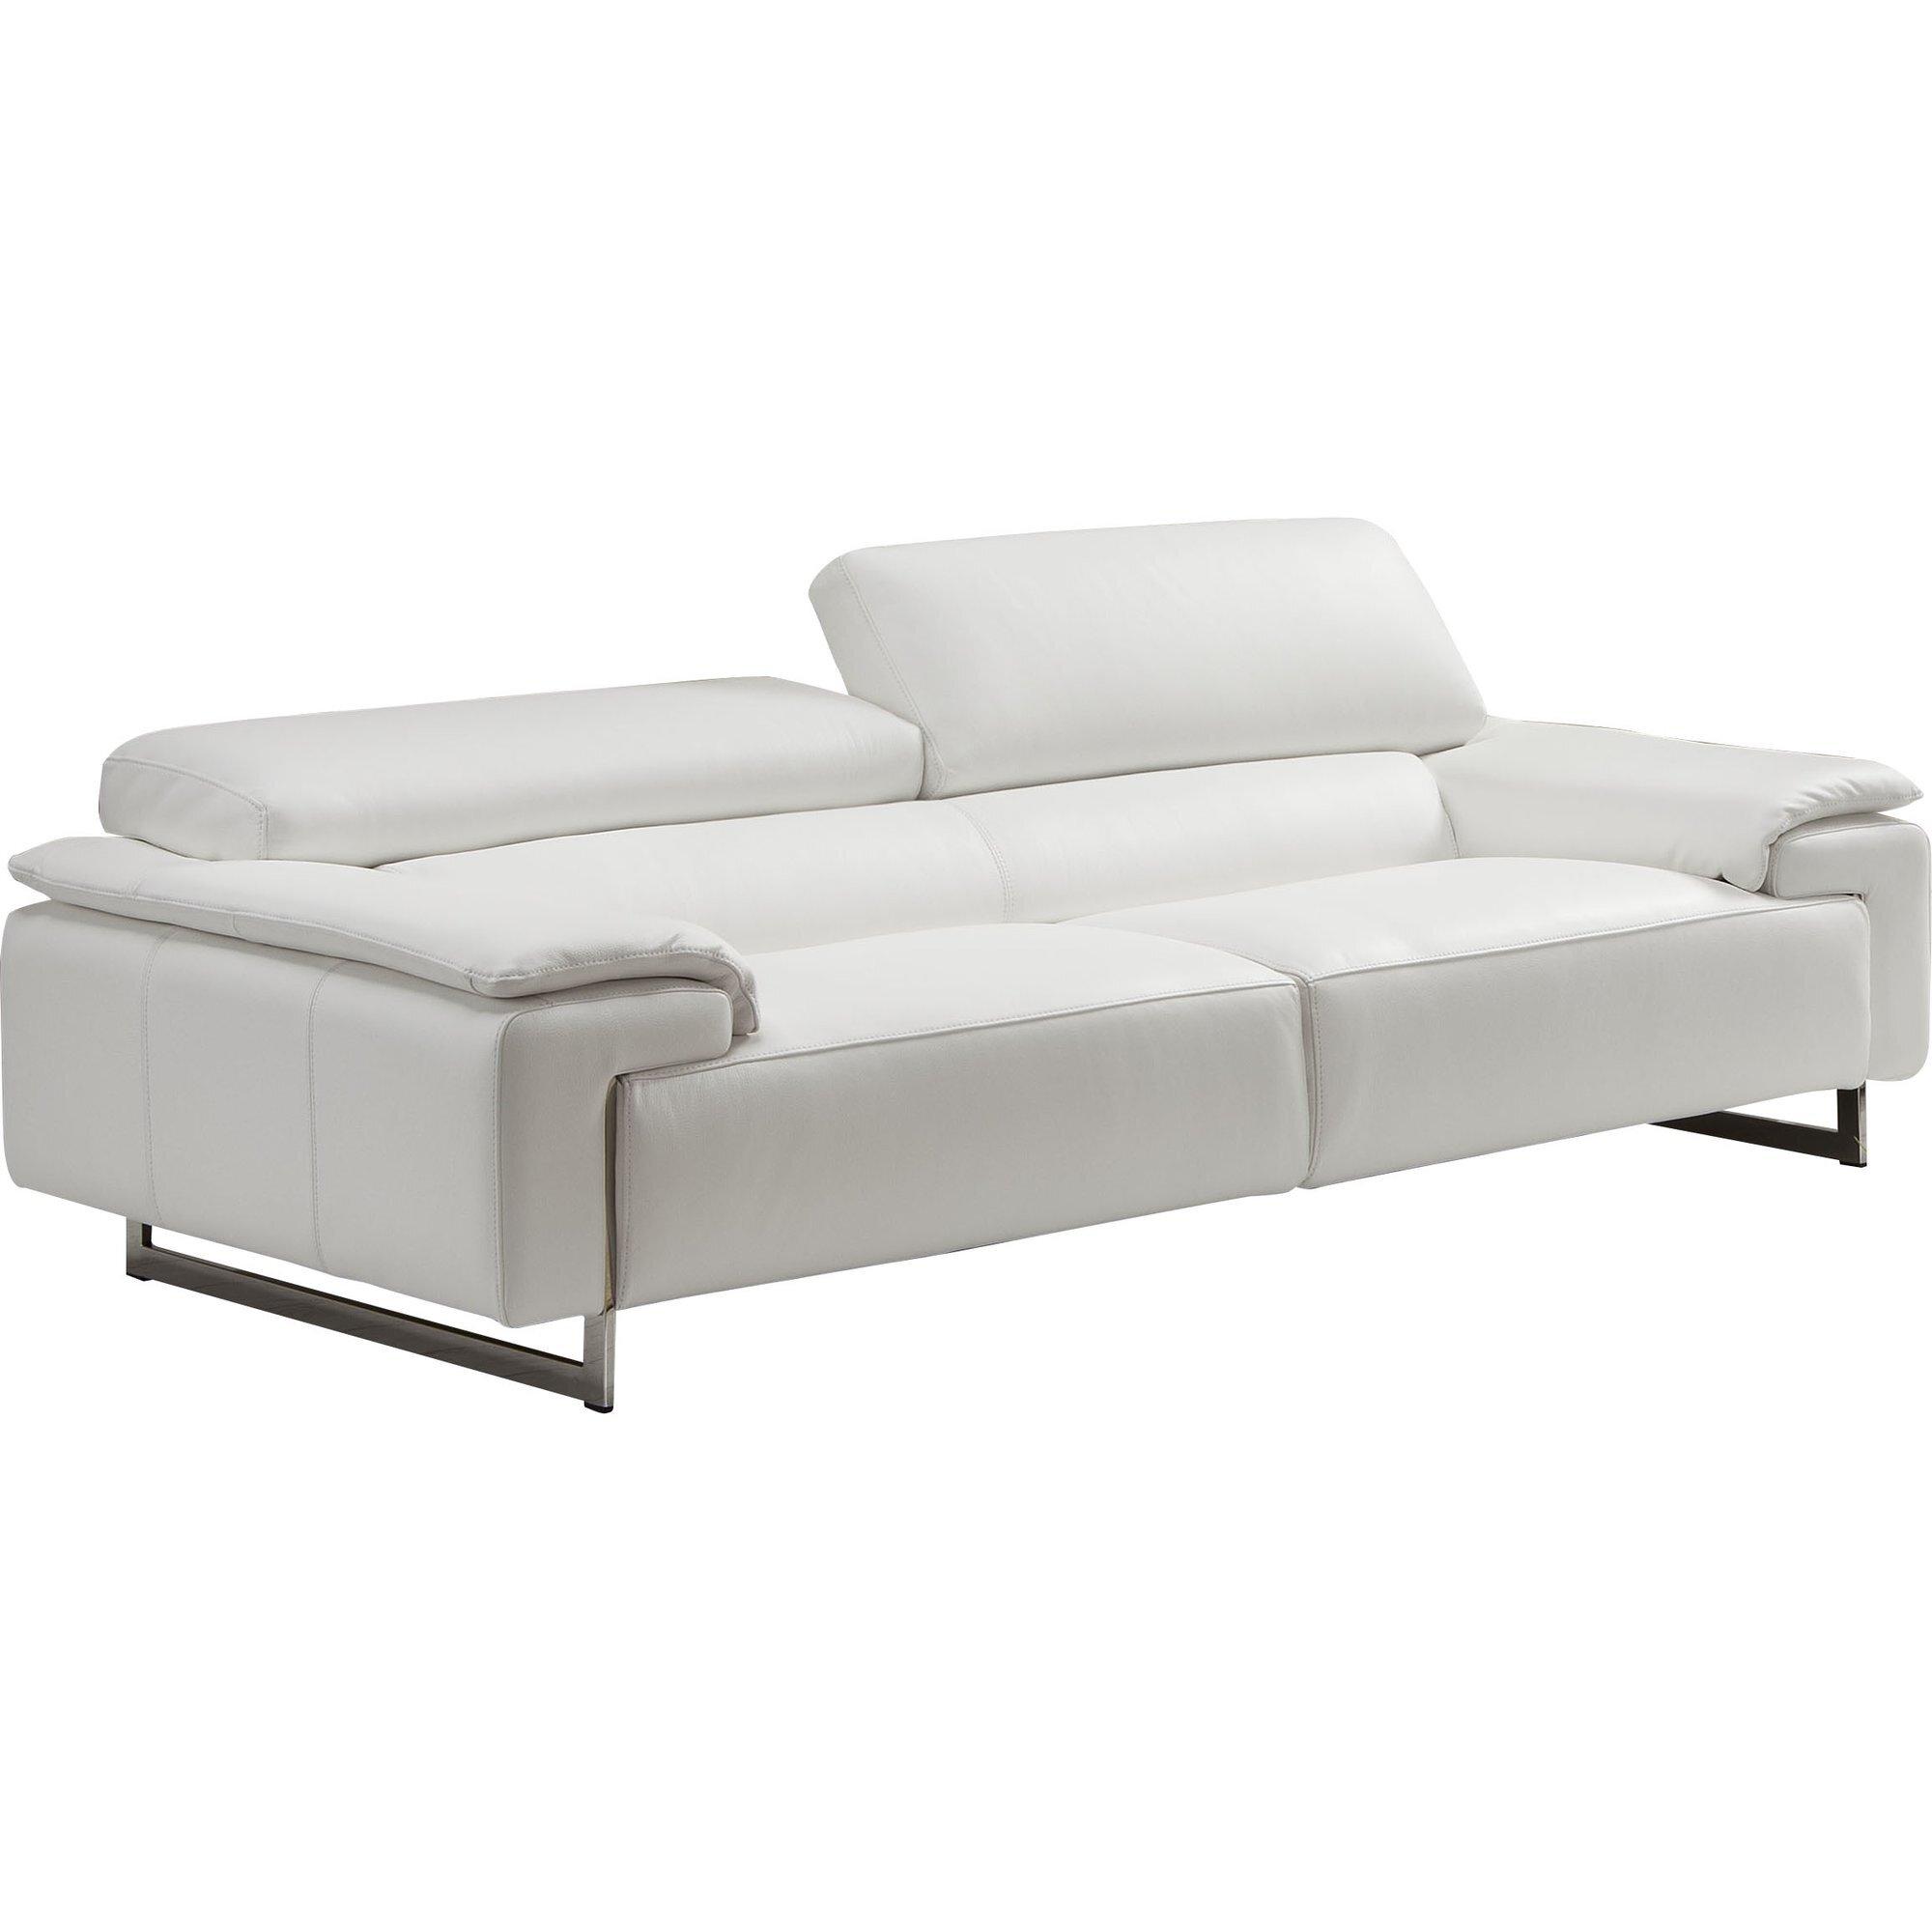 Opera divani 3 sitzer sofa vanity bewertungen Sofa dampfreiniger